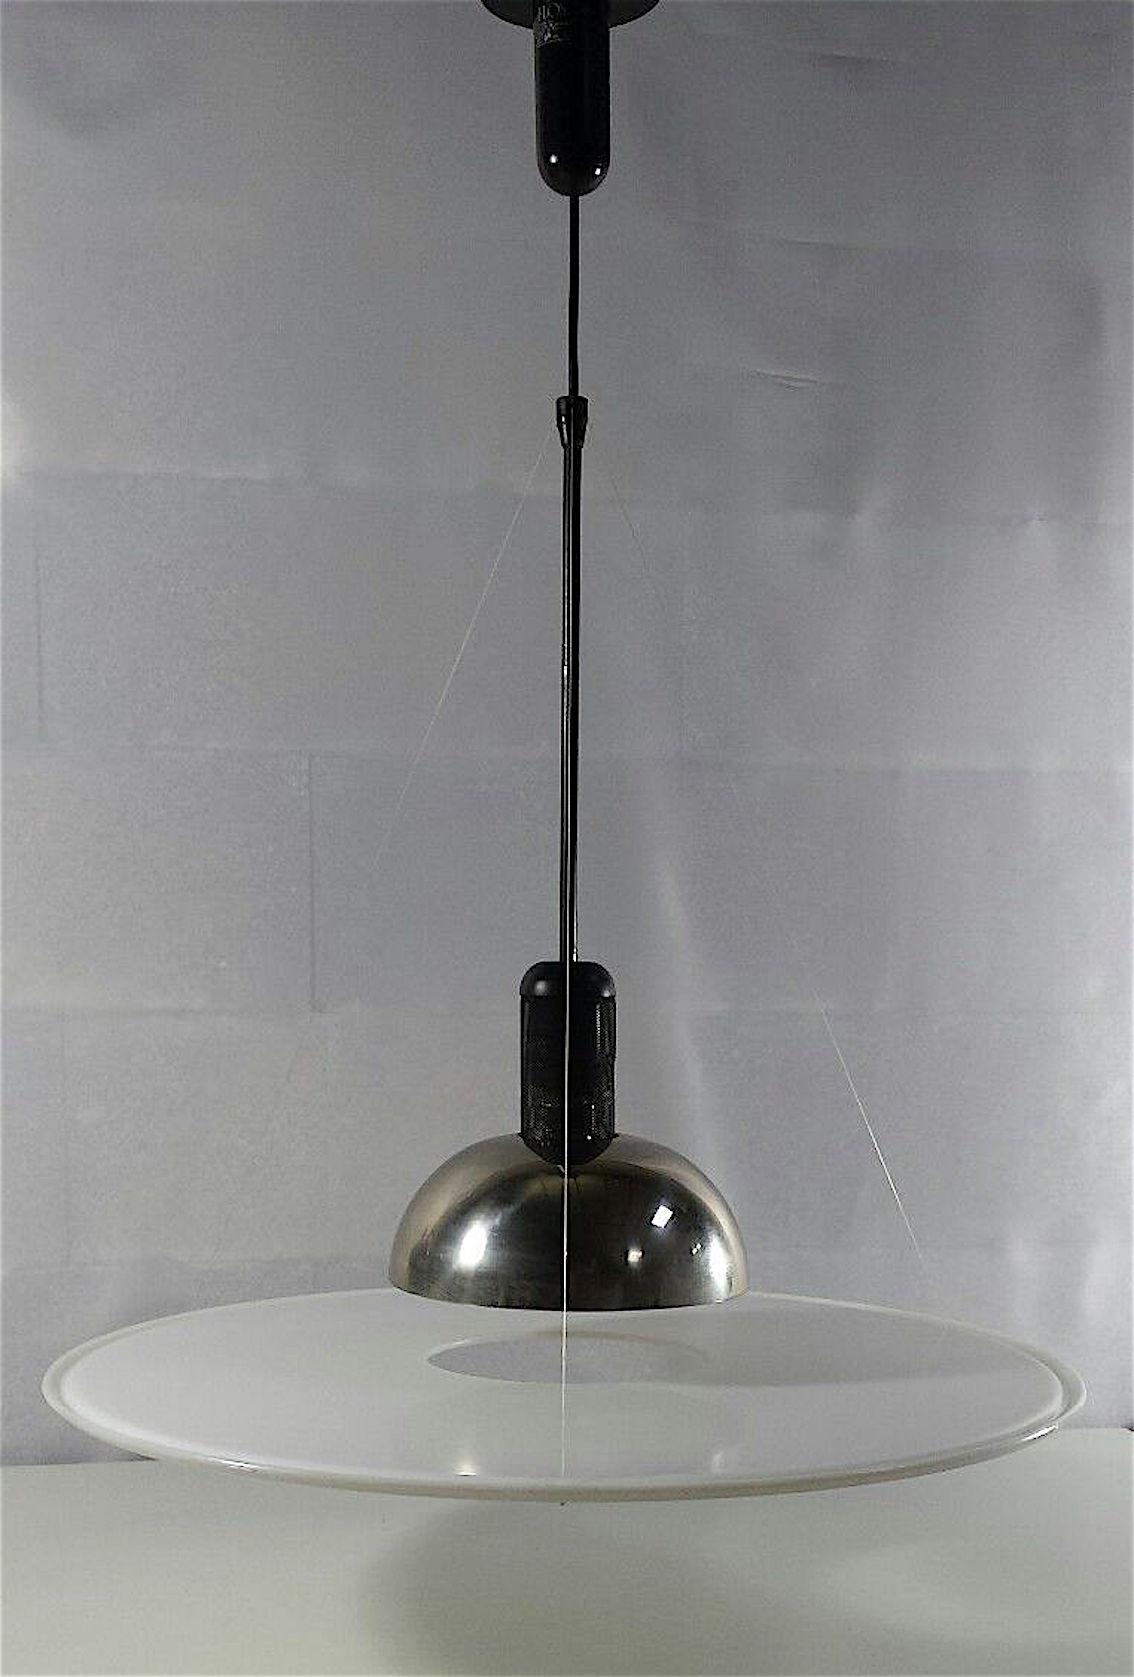 Massimo Vignelli for Flos Italia Frisbi Pendant Light ...